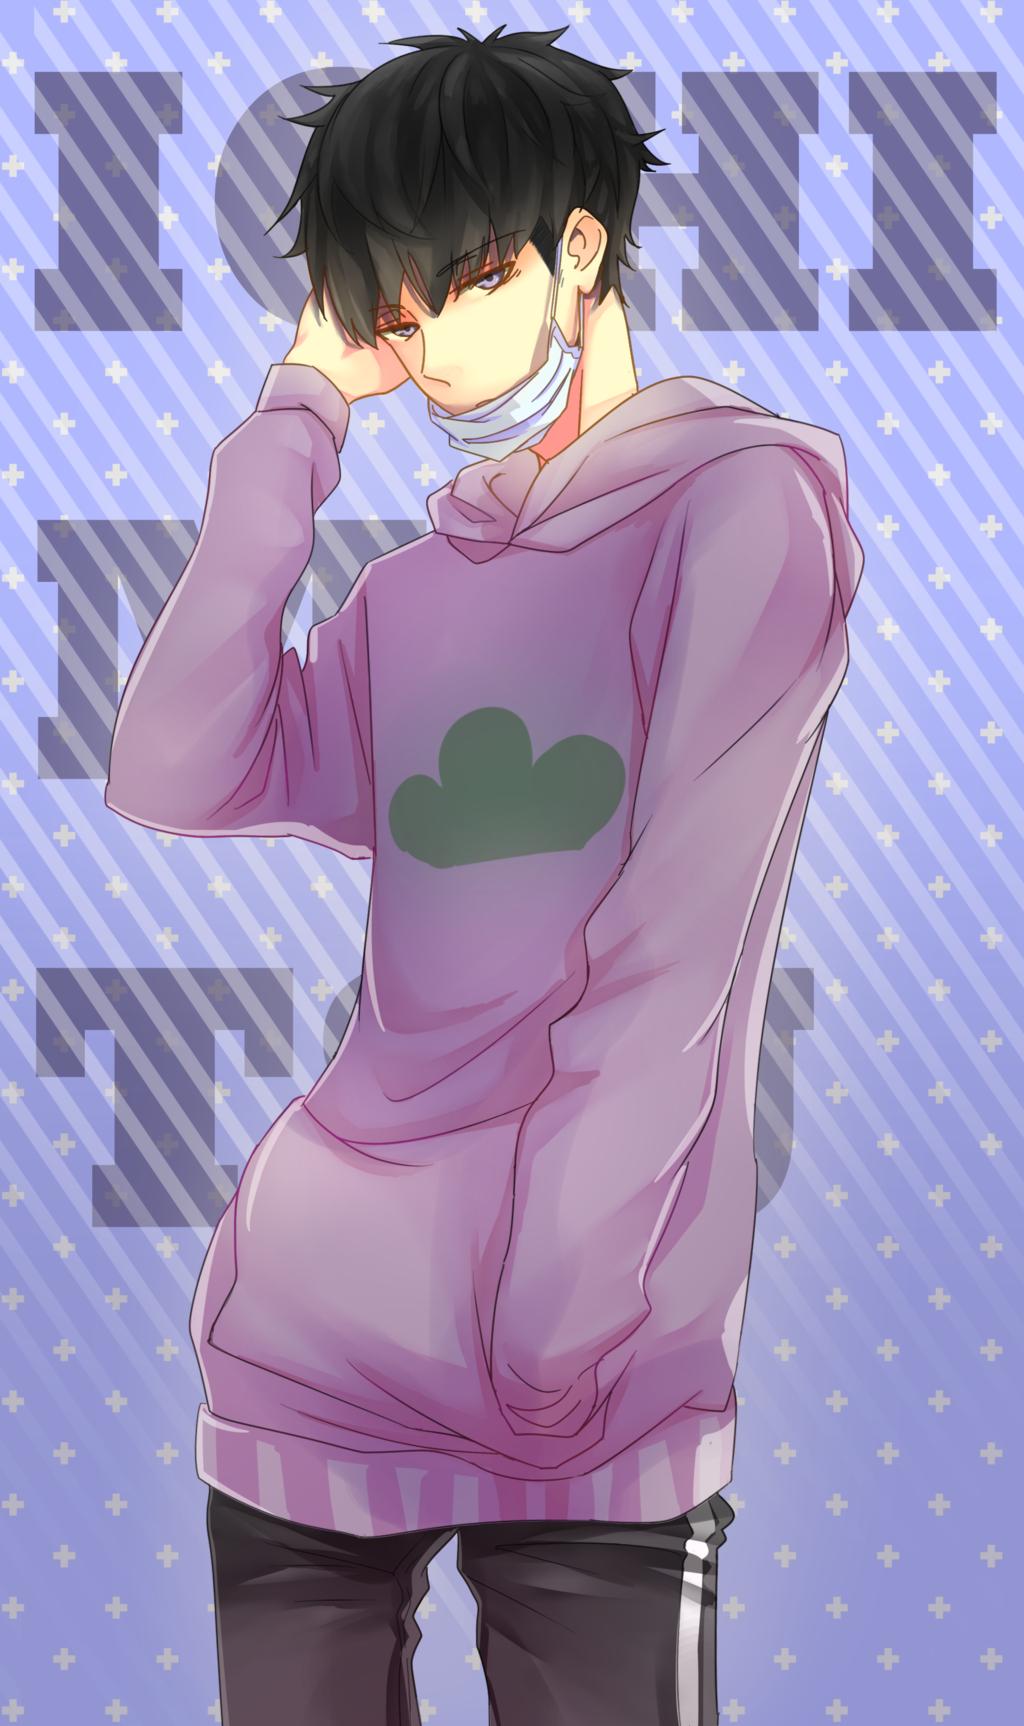 Ichimatsu As Persona 5 Protagonist By Rae Stuff On Deviantart Anime Cosplay Anime Anime Baby